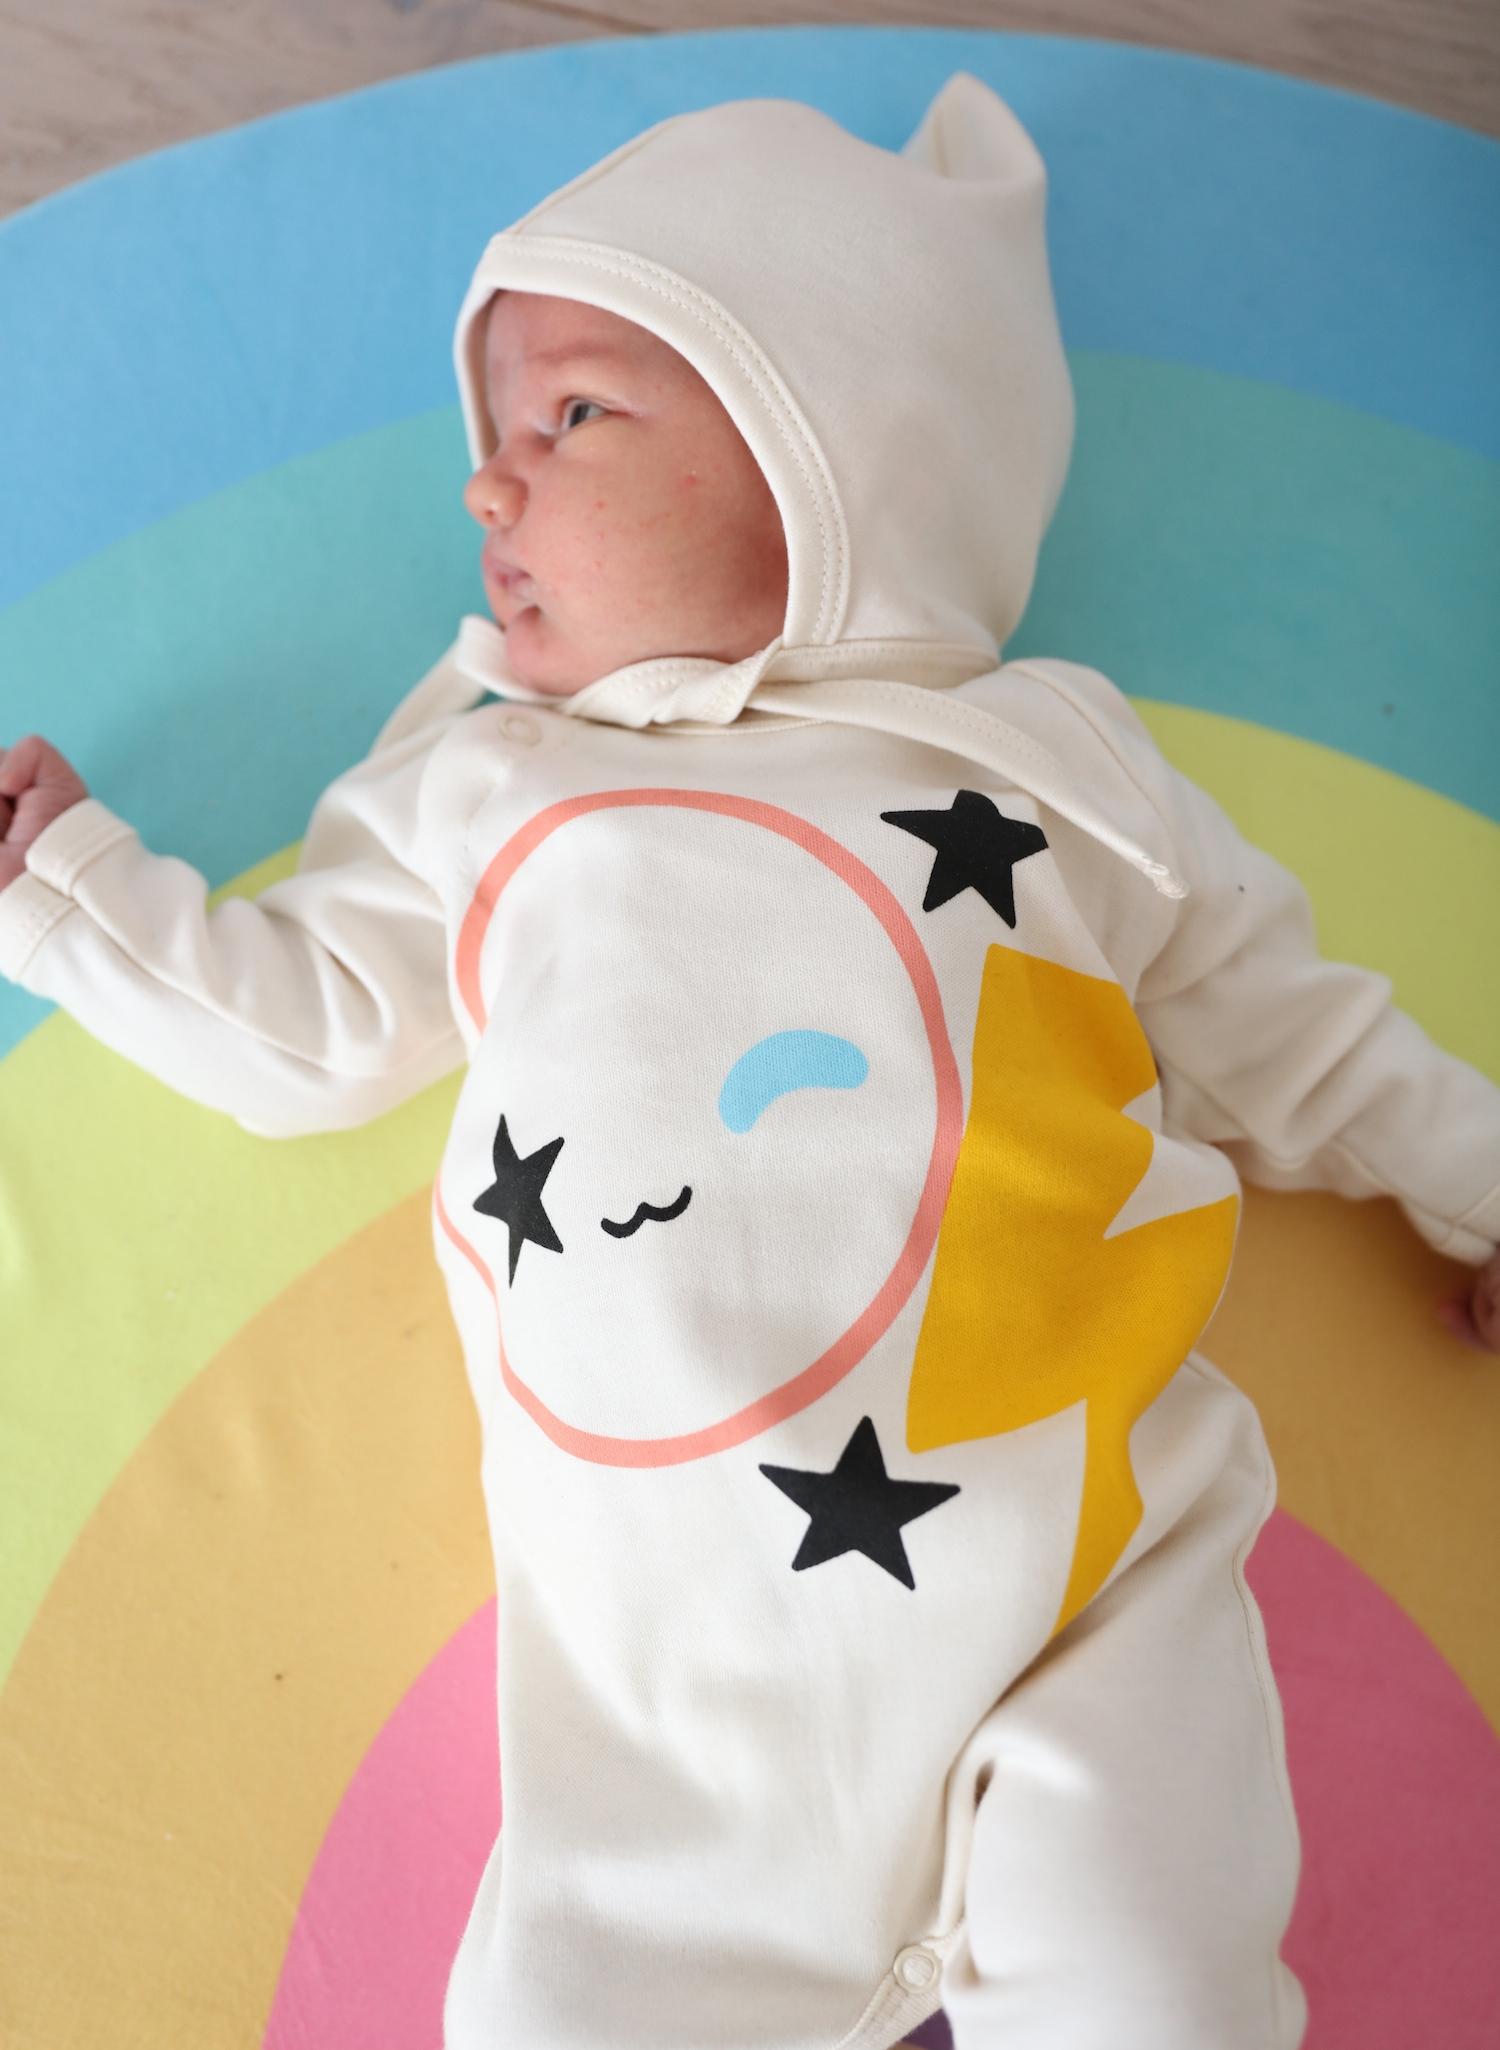 moobles_toobles_baby_jumpsuit_romper_bonnet_kids-boetiek_rainbow